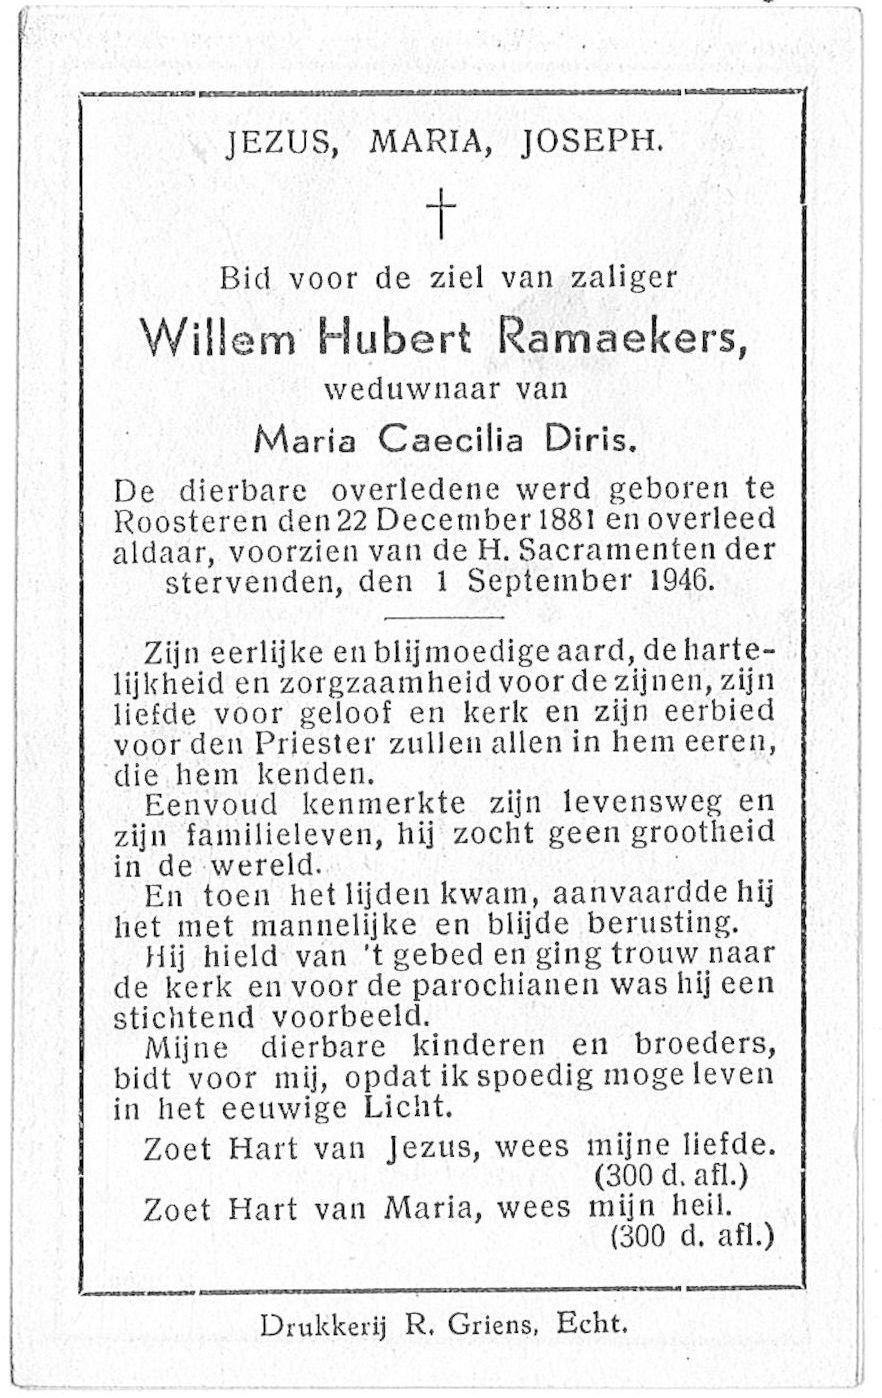 Willem Hubert Ramaekers